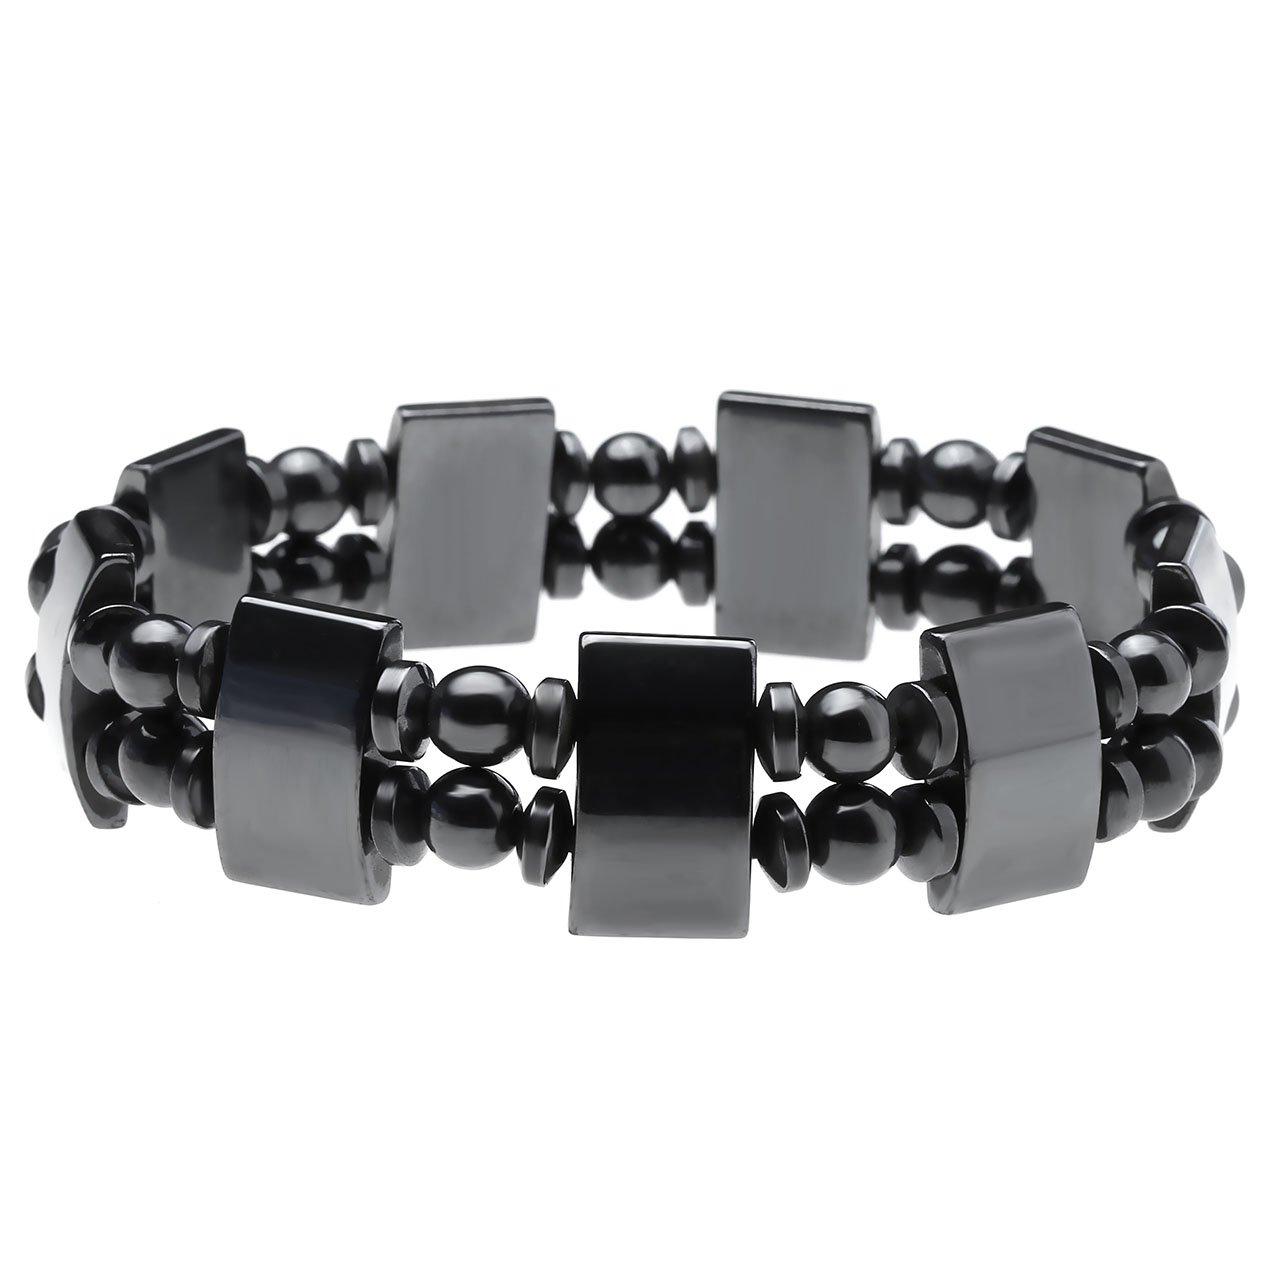 Top Plaza 2pcs/set Men's Women's Hematite Metal Healing Energy Magnetic Therapy Bracelets, 6.5 Inches